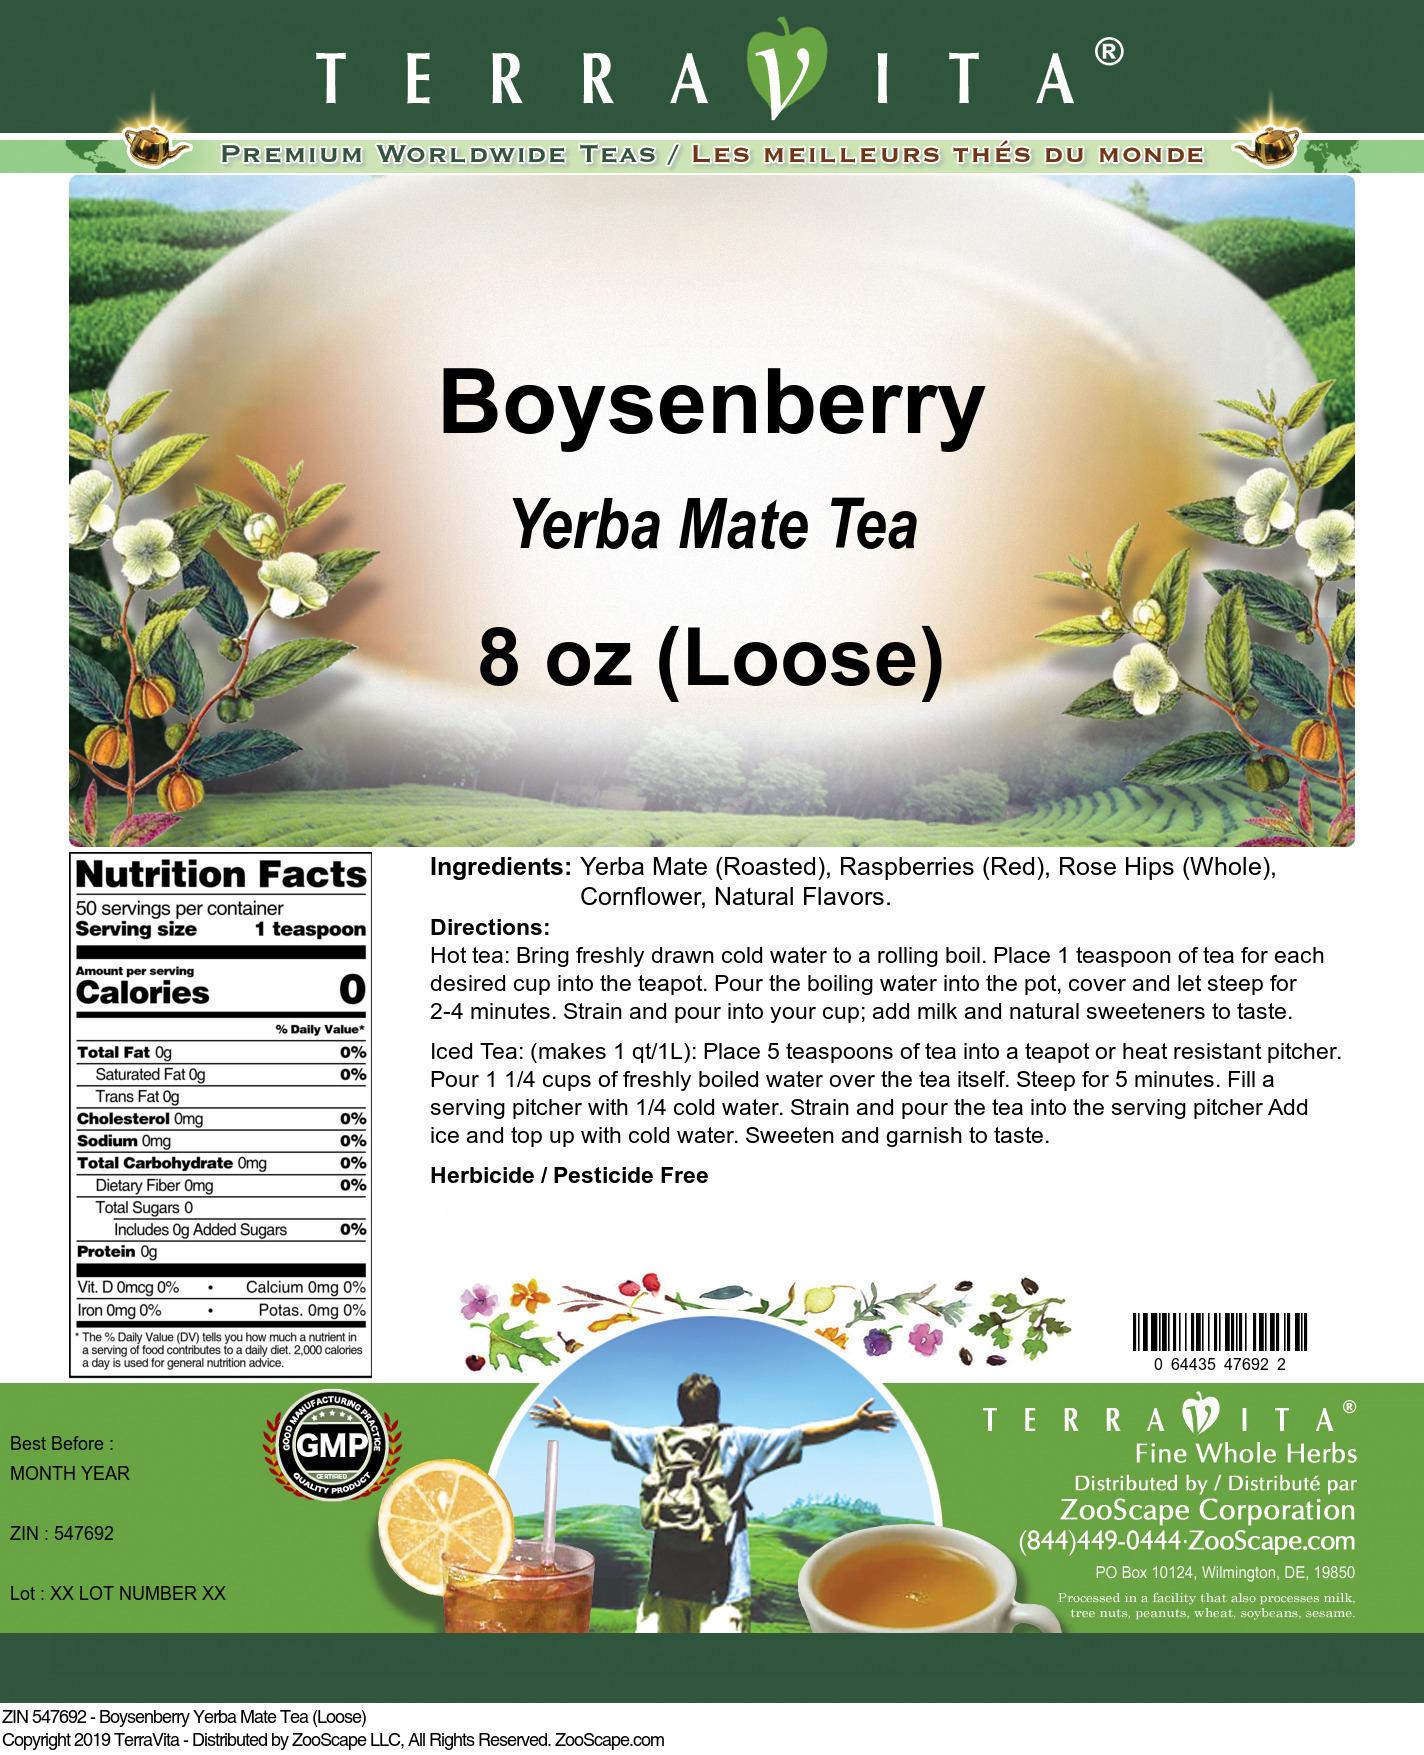 Boysenberry Yerba Mate